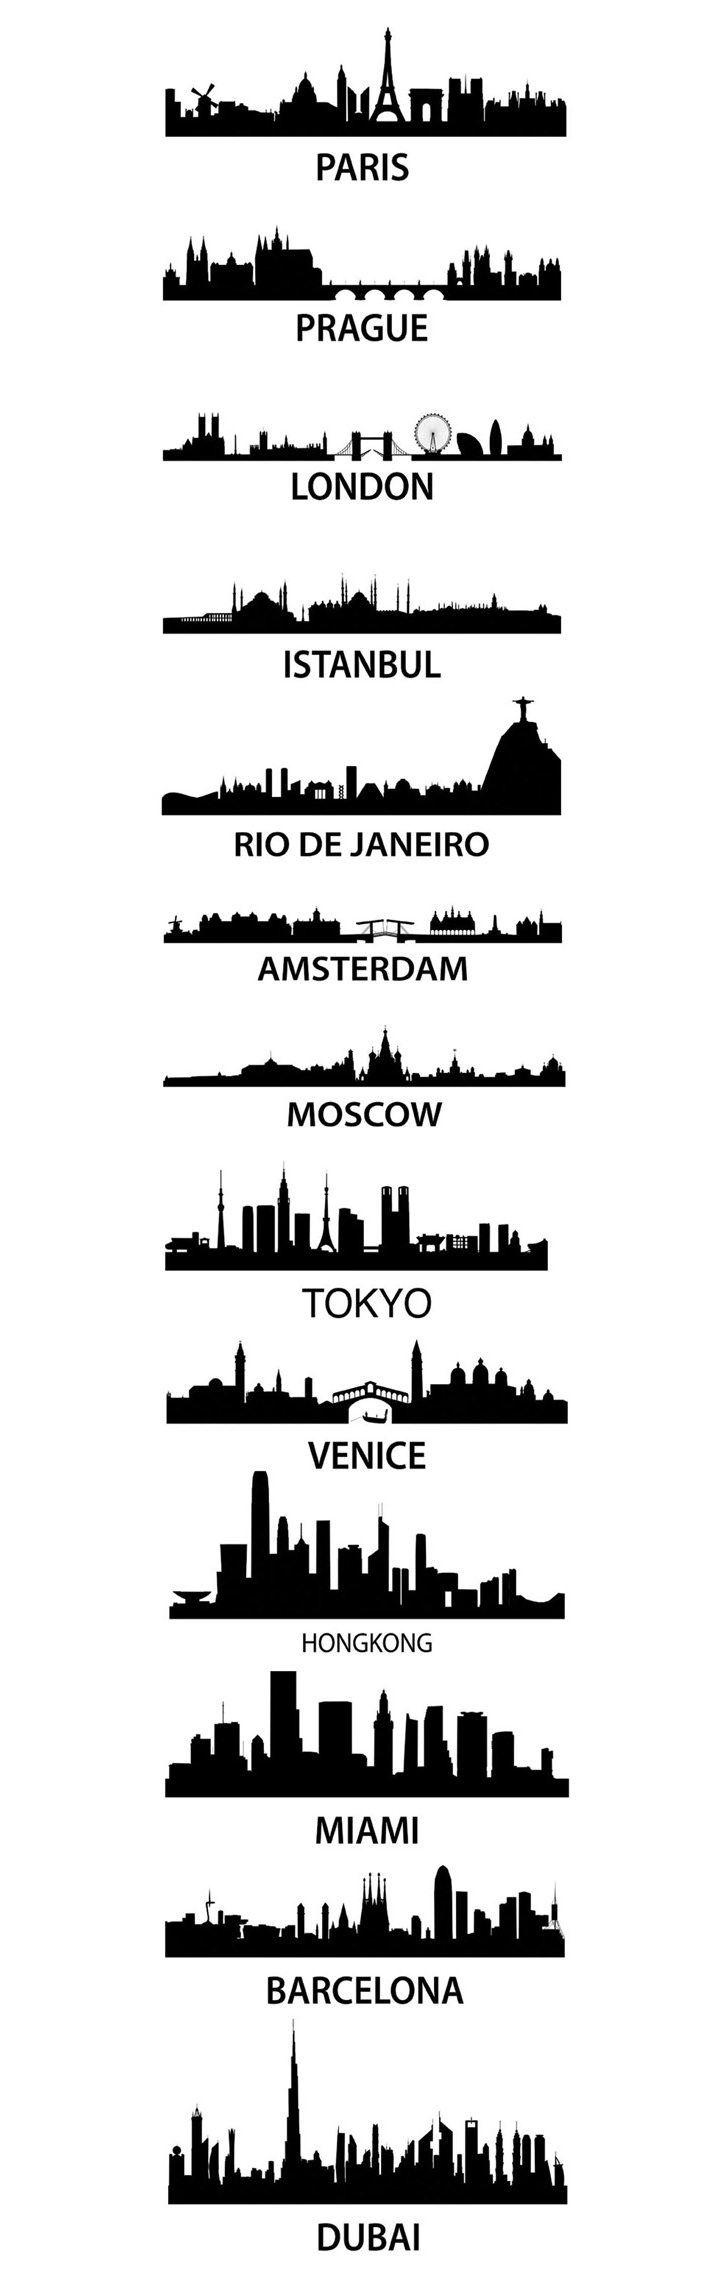 City Skyscape aka silhouette skyline of Paris, Parague, London, Istanbul, Rio De Janeiro, Amsterdam, Moscow, Tokyo, Venice, Hong Kong, Miami, Barcelona, an